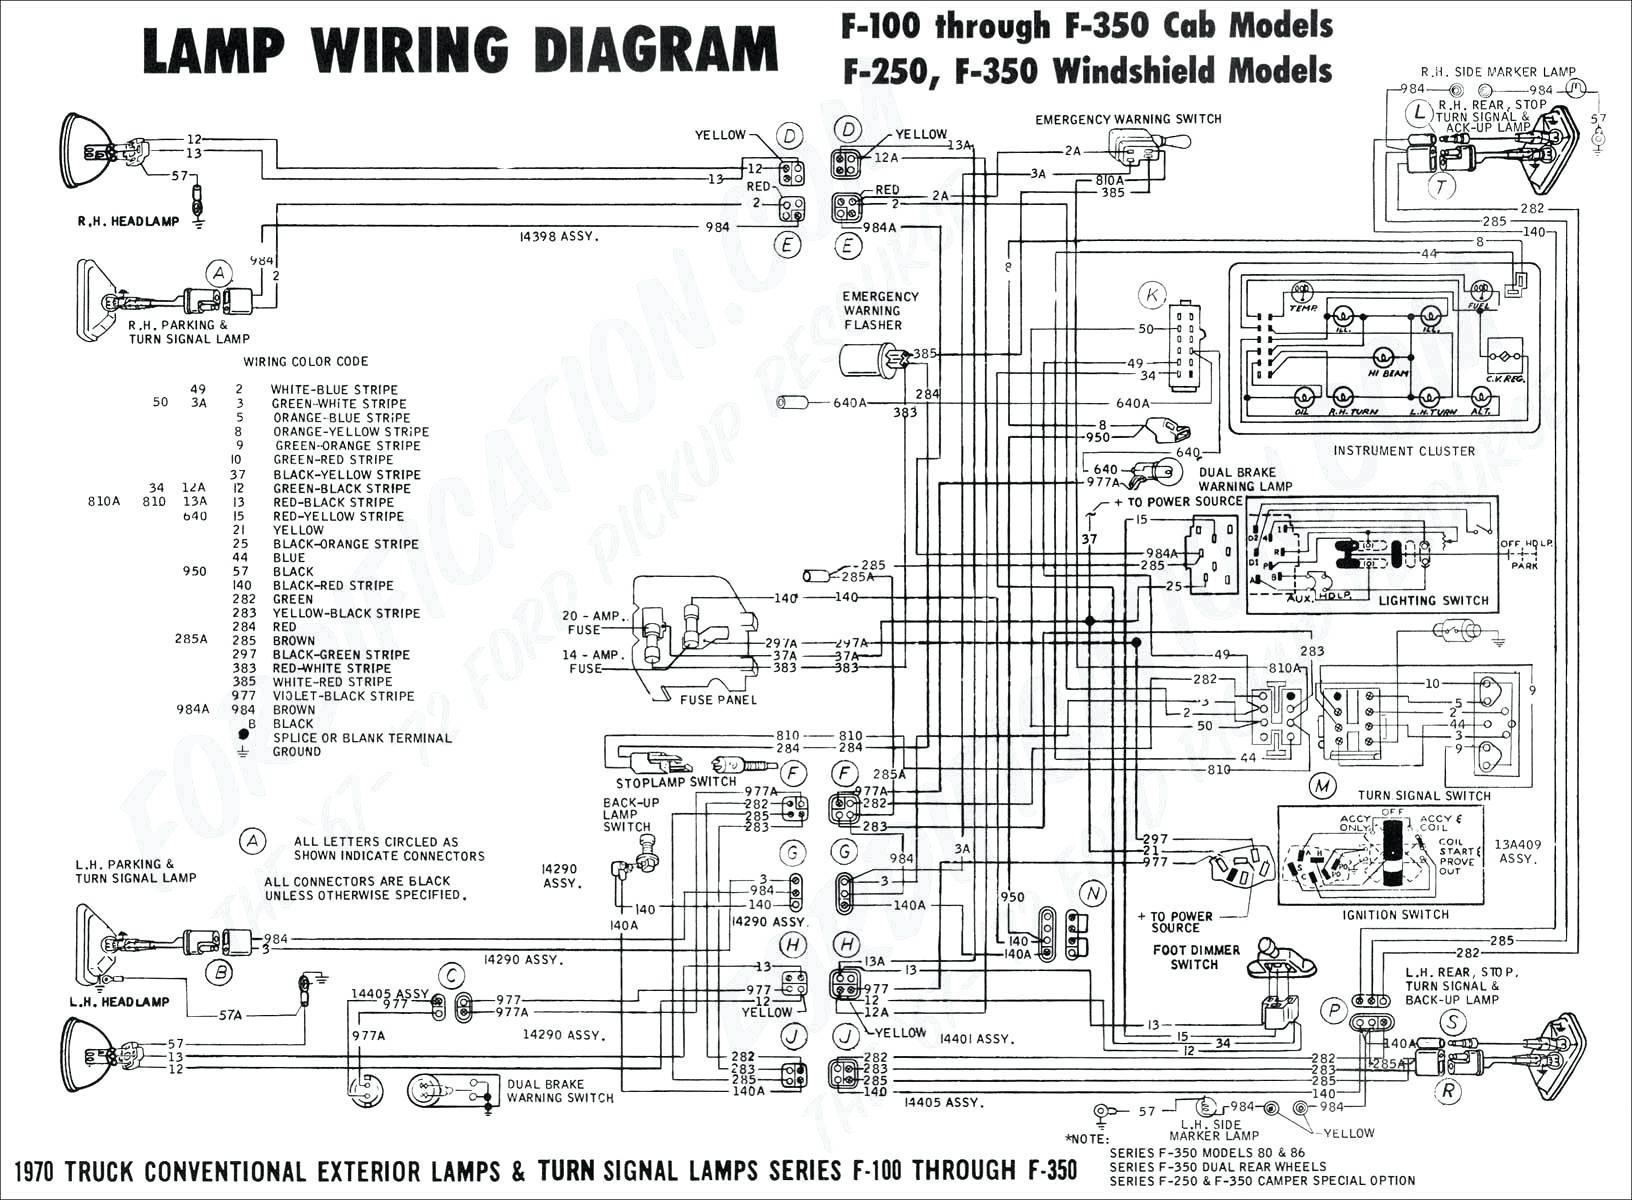 Remote Control Car Circuit Diagram Power Control Circuit Controlcircuit Circuit Diagram Seekic Of Remote Control Car Circuit Diagram